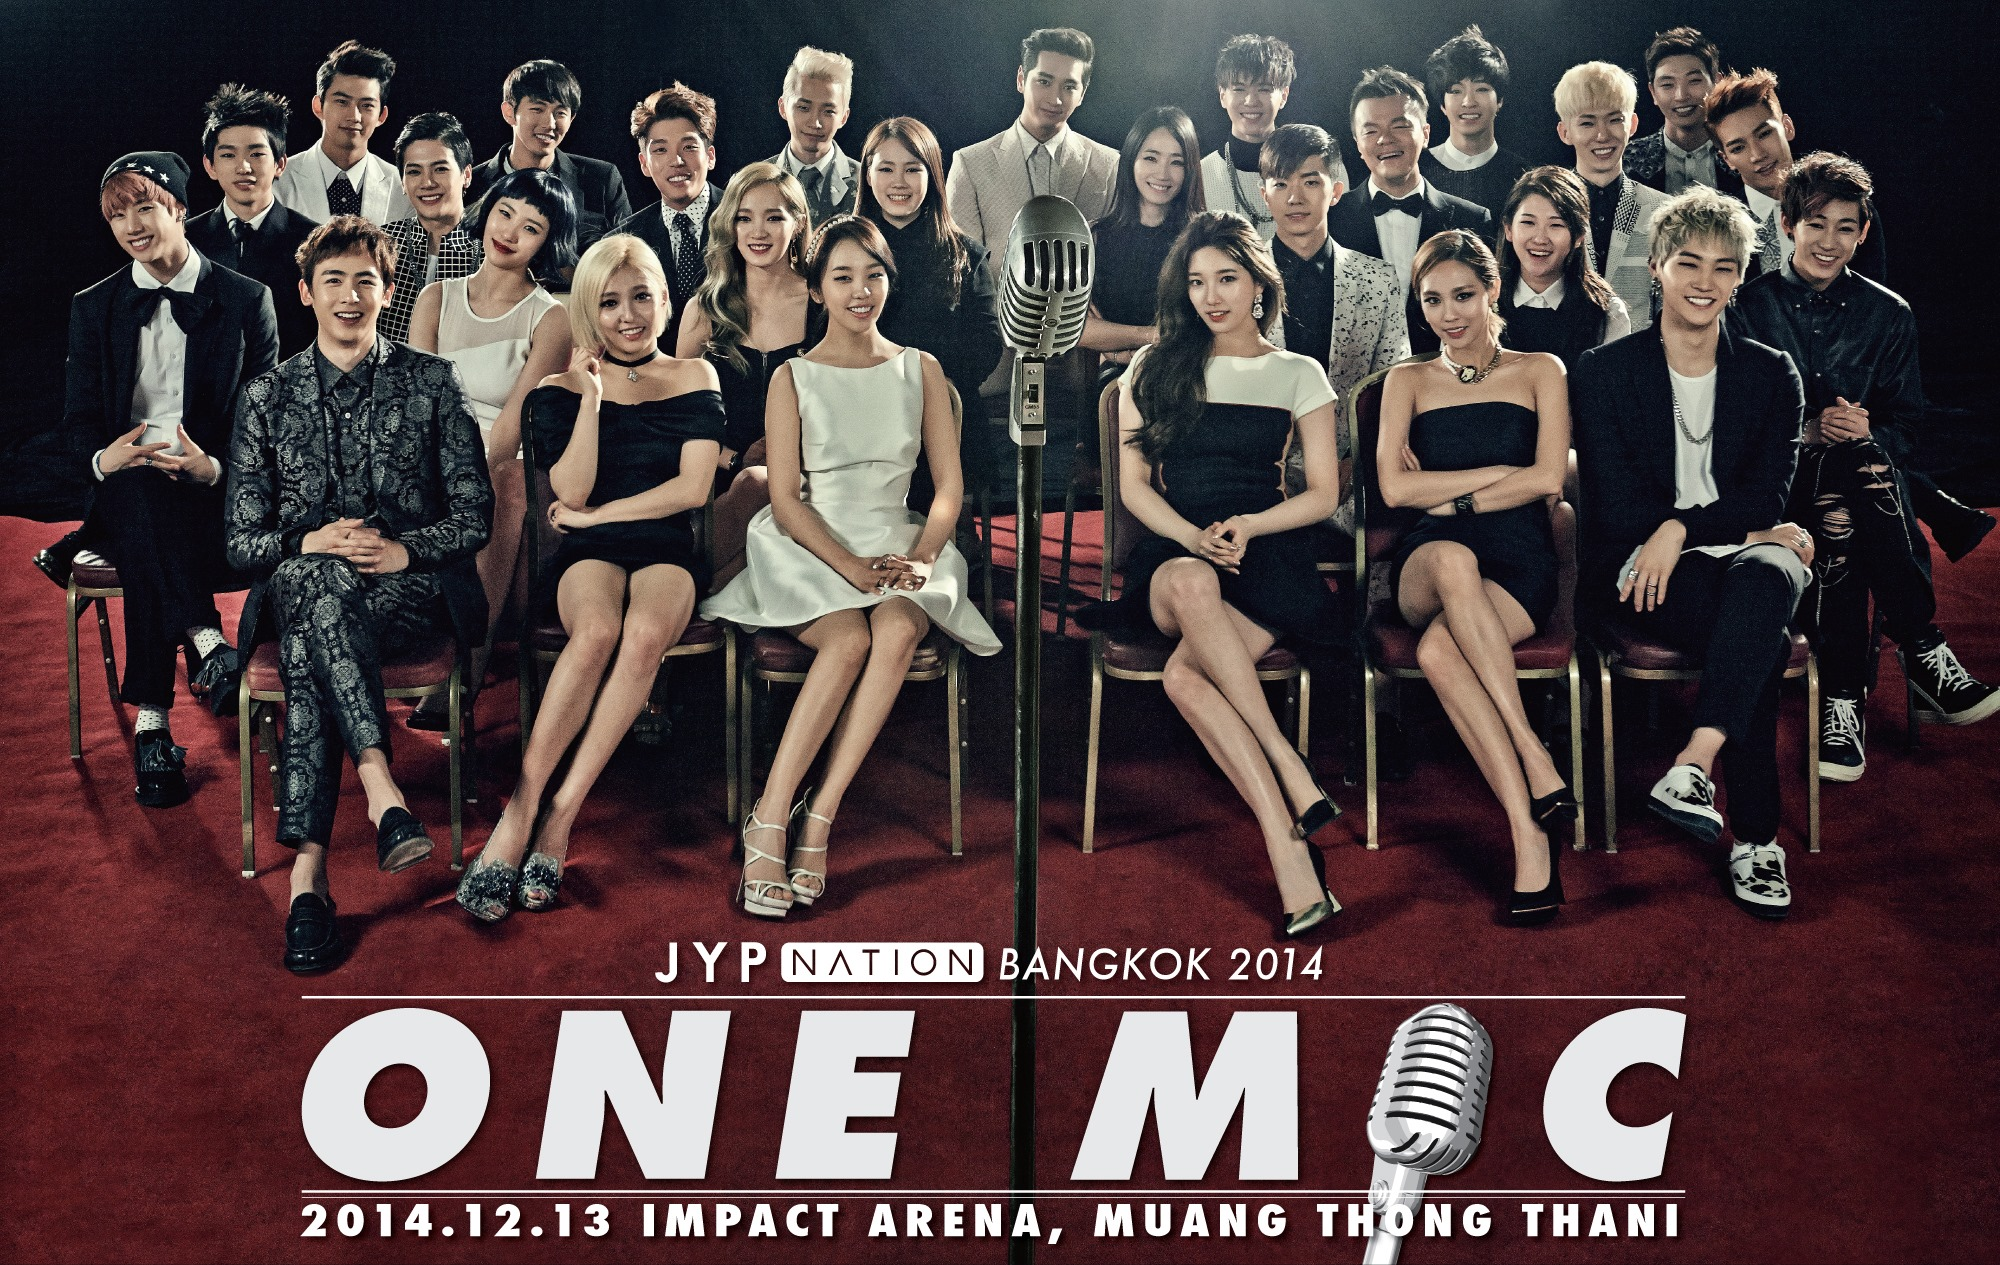 JYP娛樂:不知如何宣傳,好像水倒進杯裡不知道如何控制何時會滿出來一樣讓人驚慌